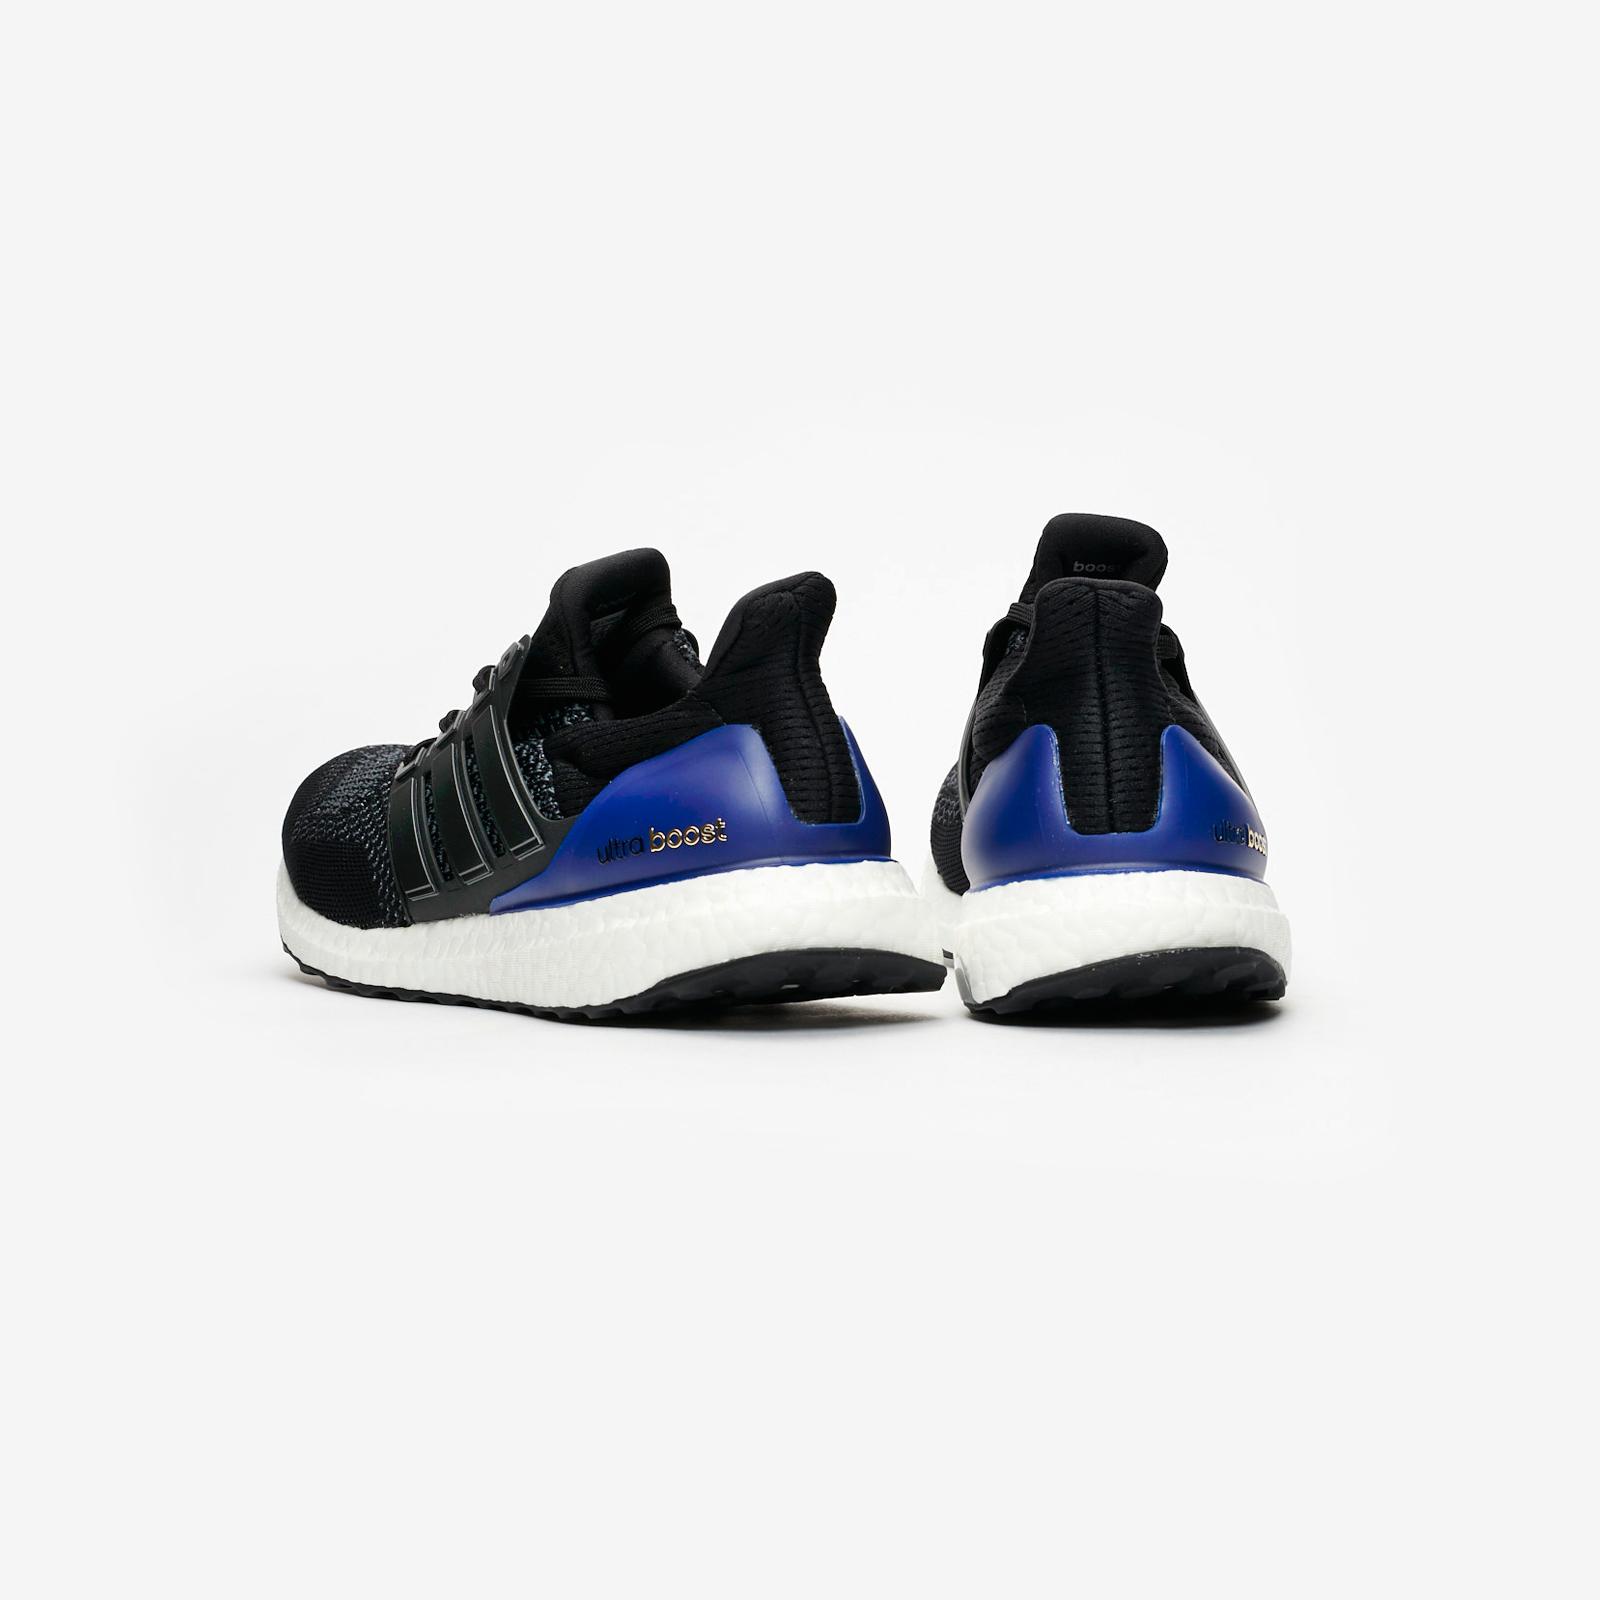 best sneakers 9cbc4 4a89b adidas Ultraboost - G28319 - Sneakersnstuff | sneakers ...